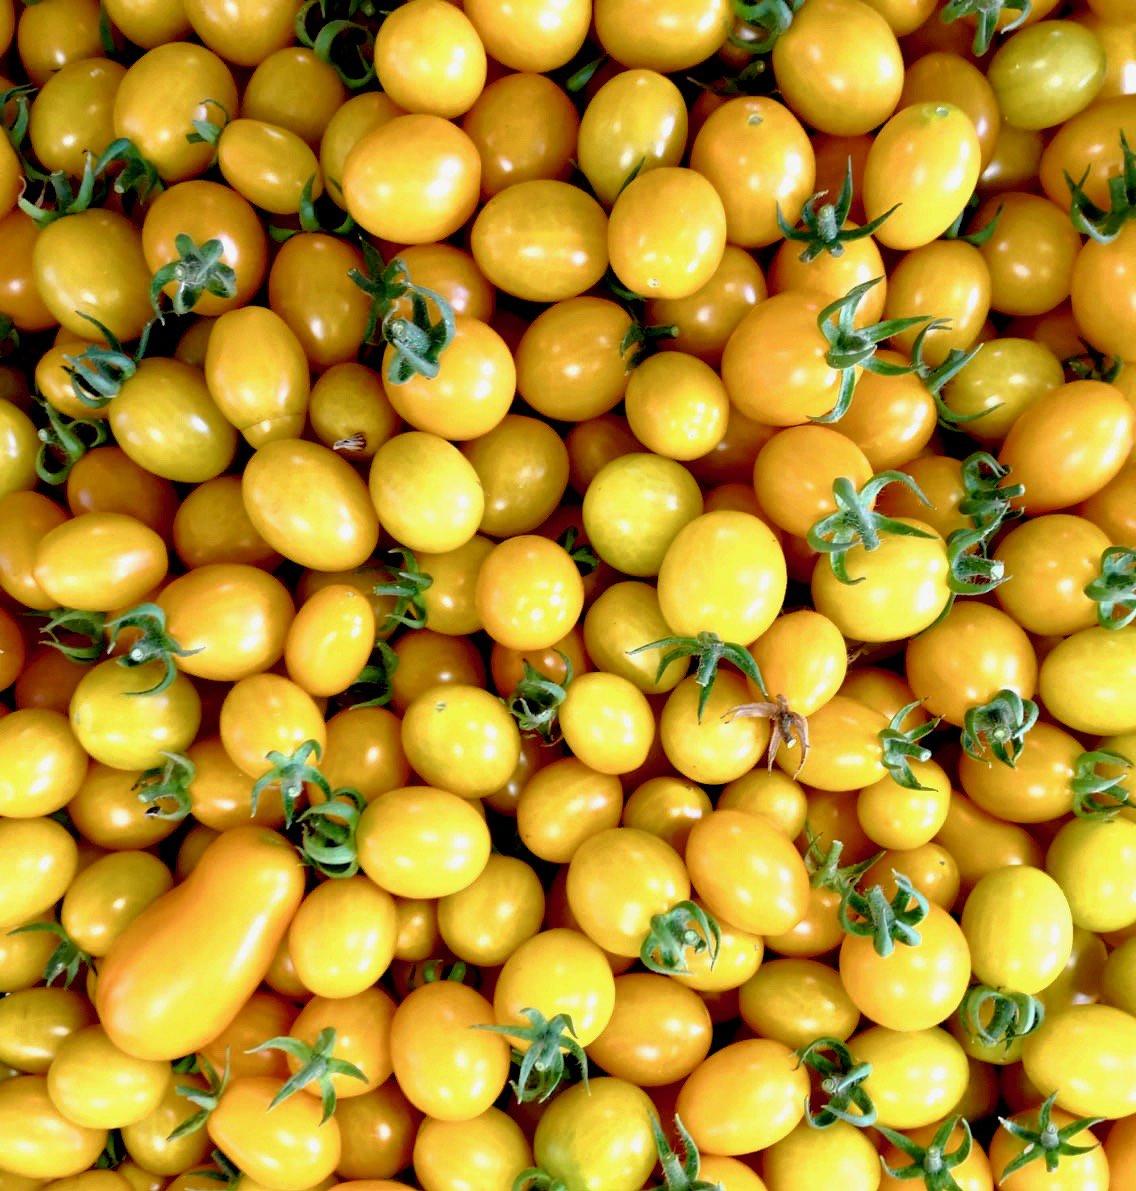 Giallo pomodoro#yellowisthenewblack #simplyisbetter #noicisiamo #mati1909 #pistoia #tuscany #cooking #food #foodblog #foodie #foodlover #foodpic #photooftheday #igersitalia #picoftheday #instadaily #ilovecooking #ilovefood #instafood #country #chic #tomatoes  - Ukustom